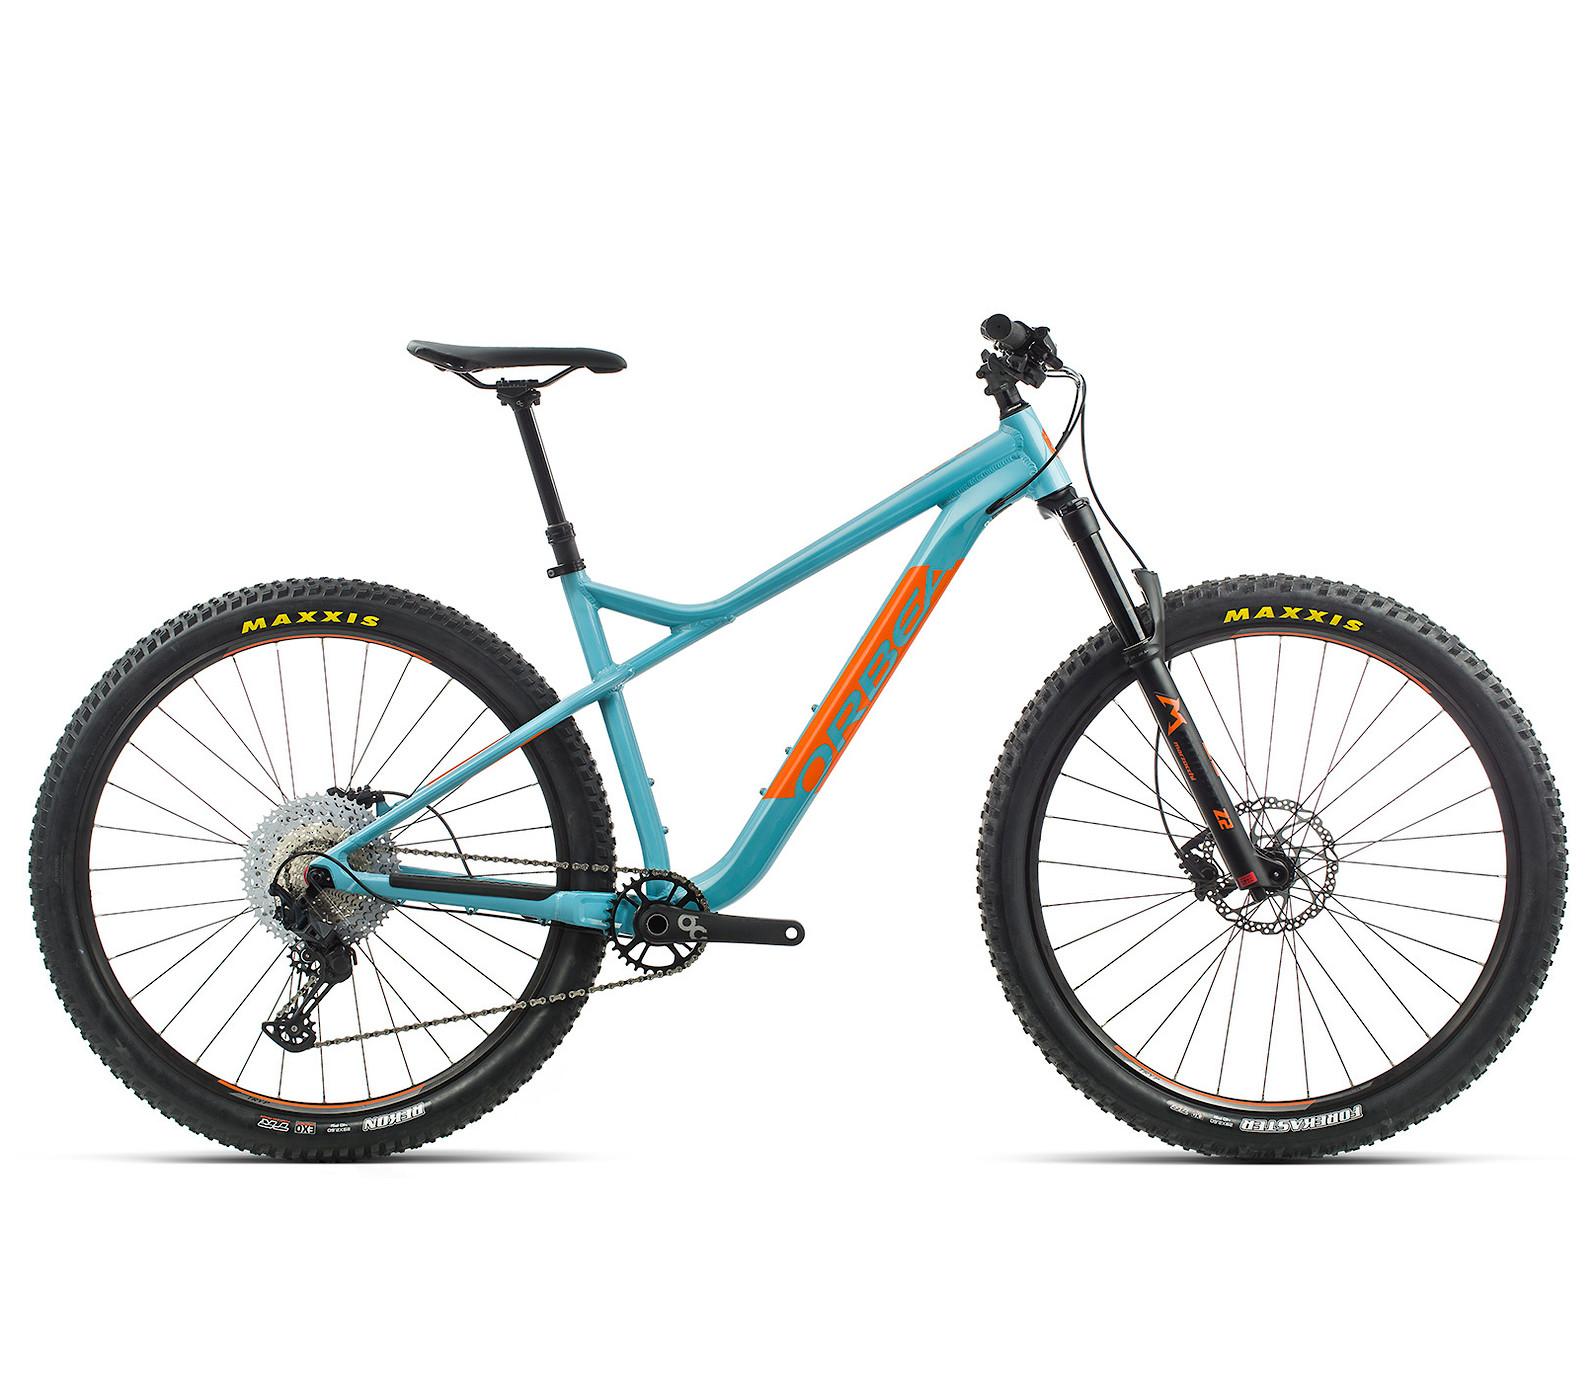 2020 Orbea Laufey H10 in blue gulf/orange